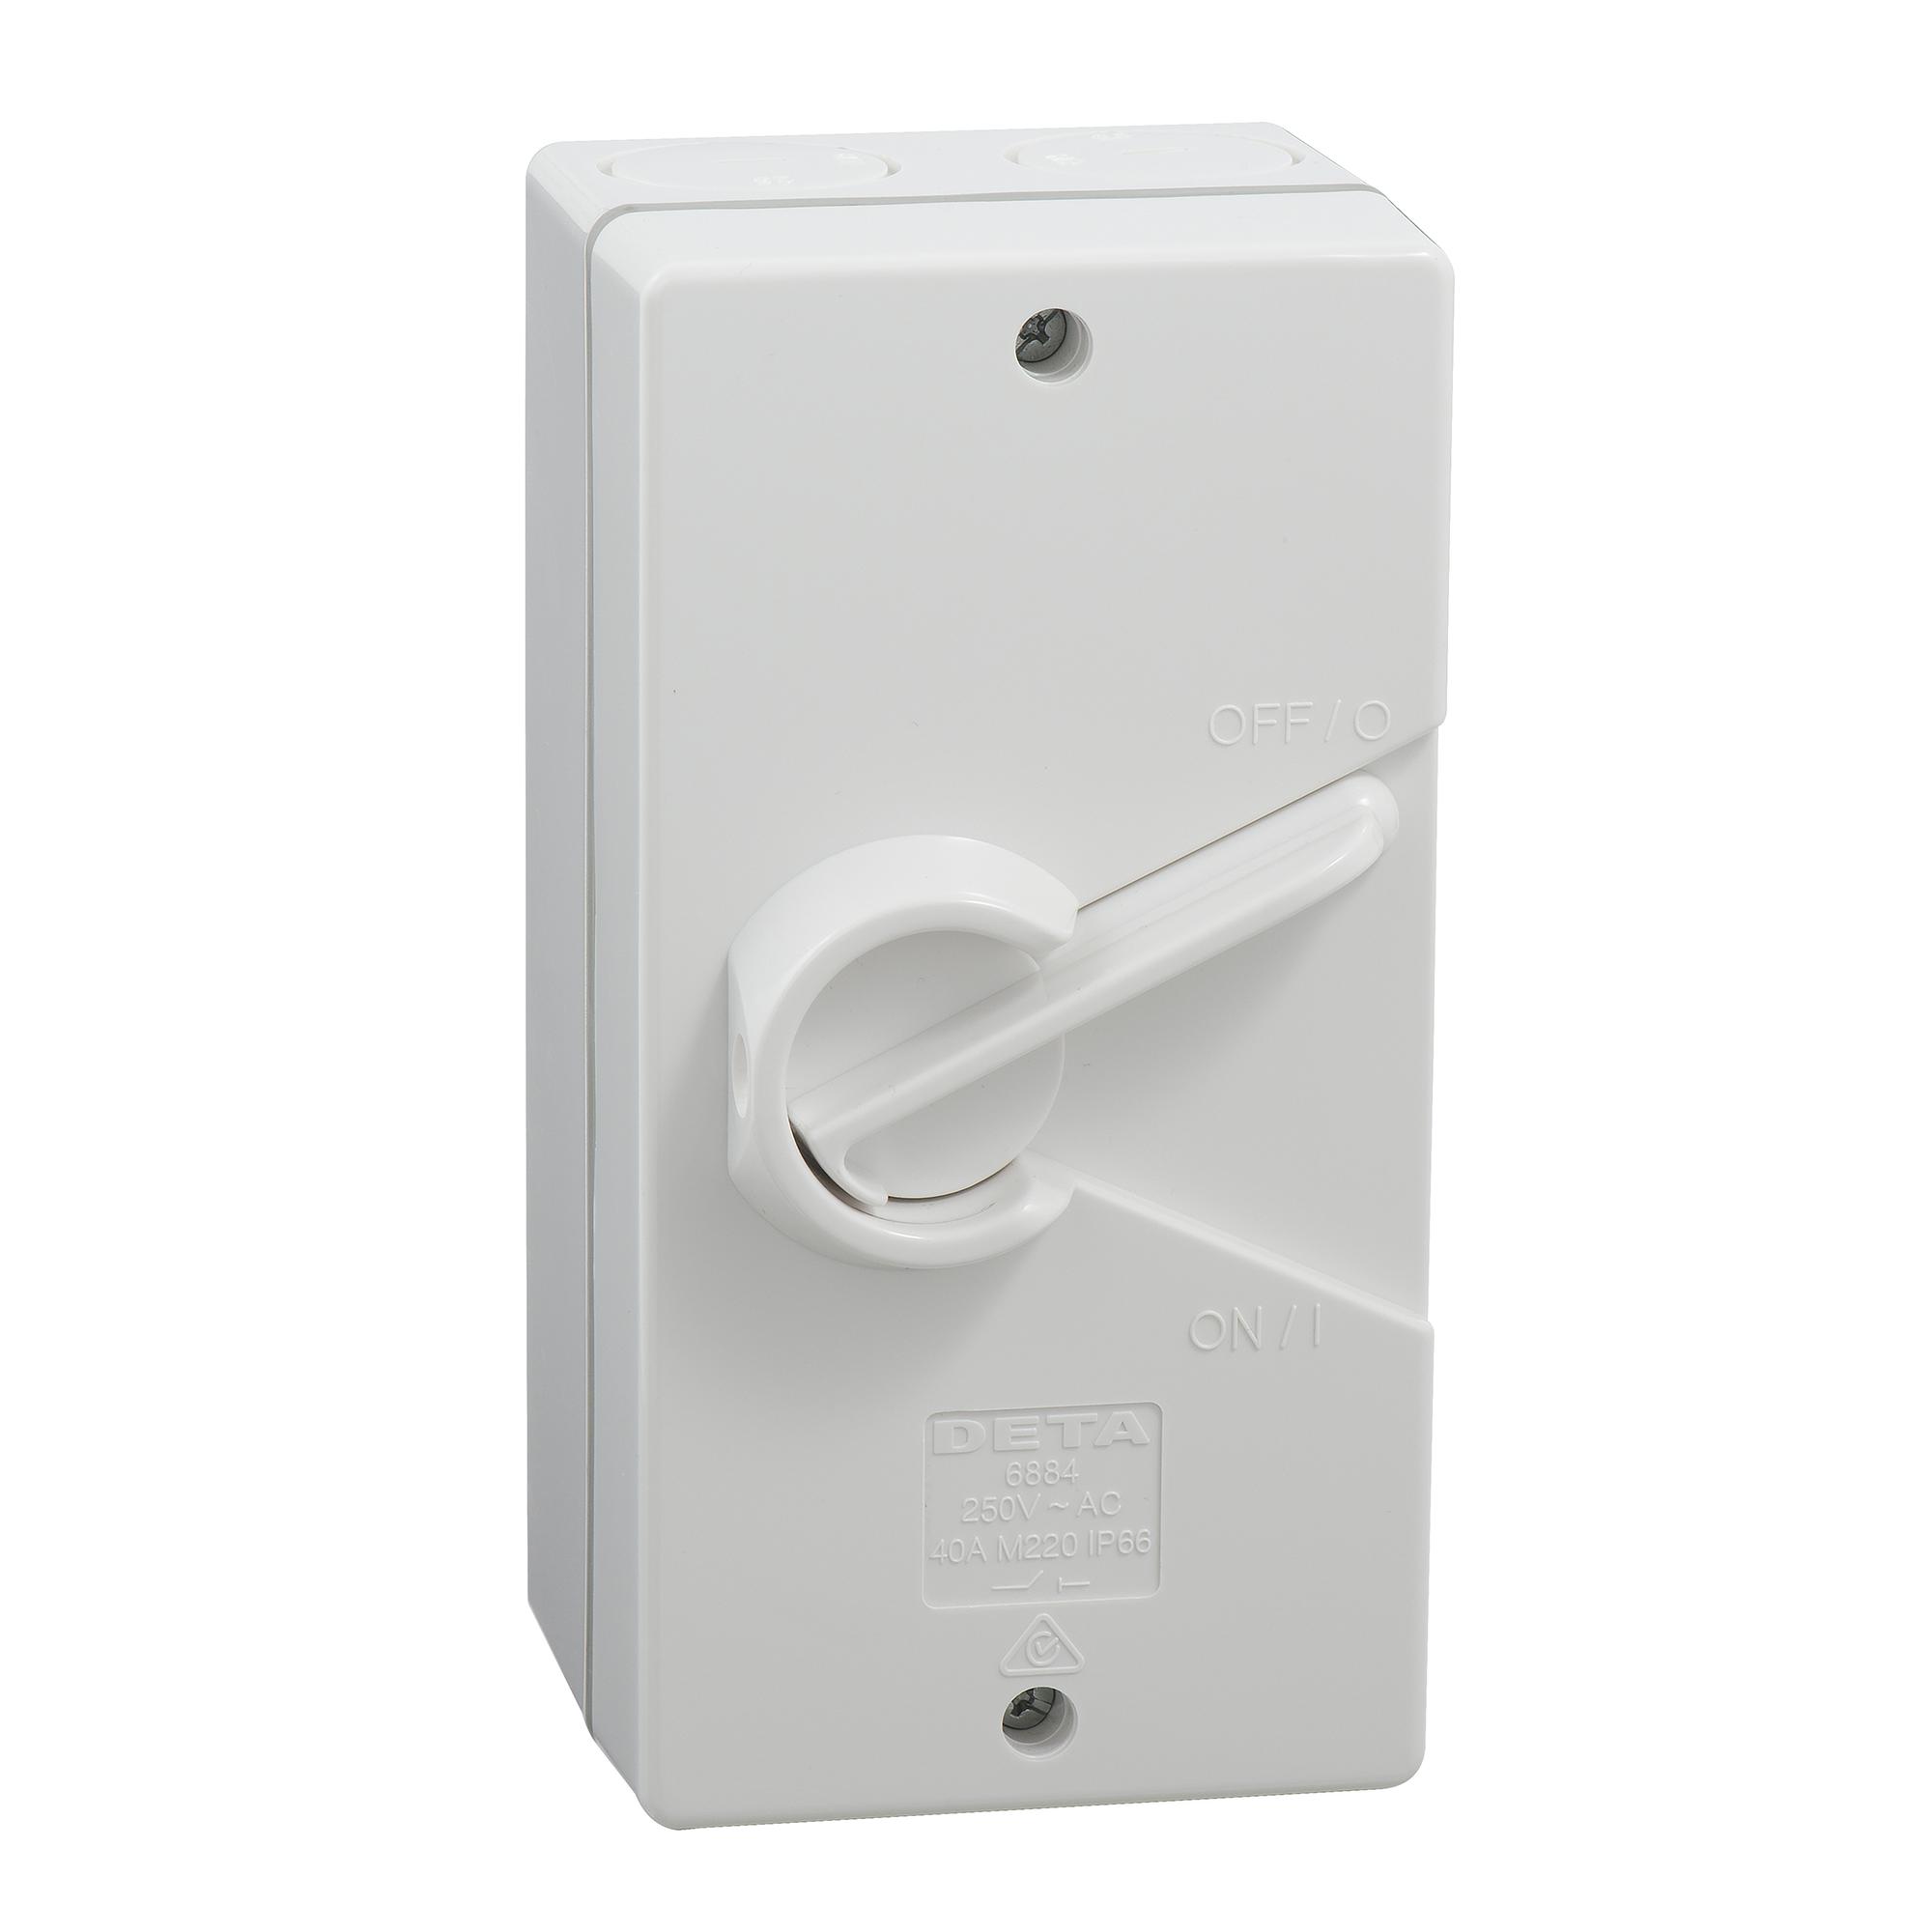 40amp weatherproof isolator